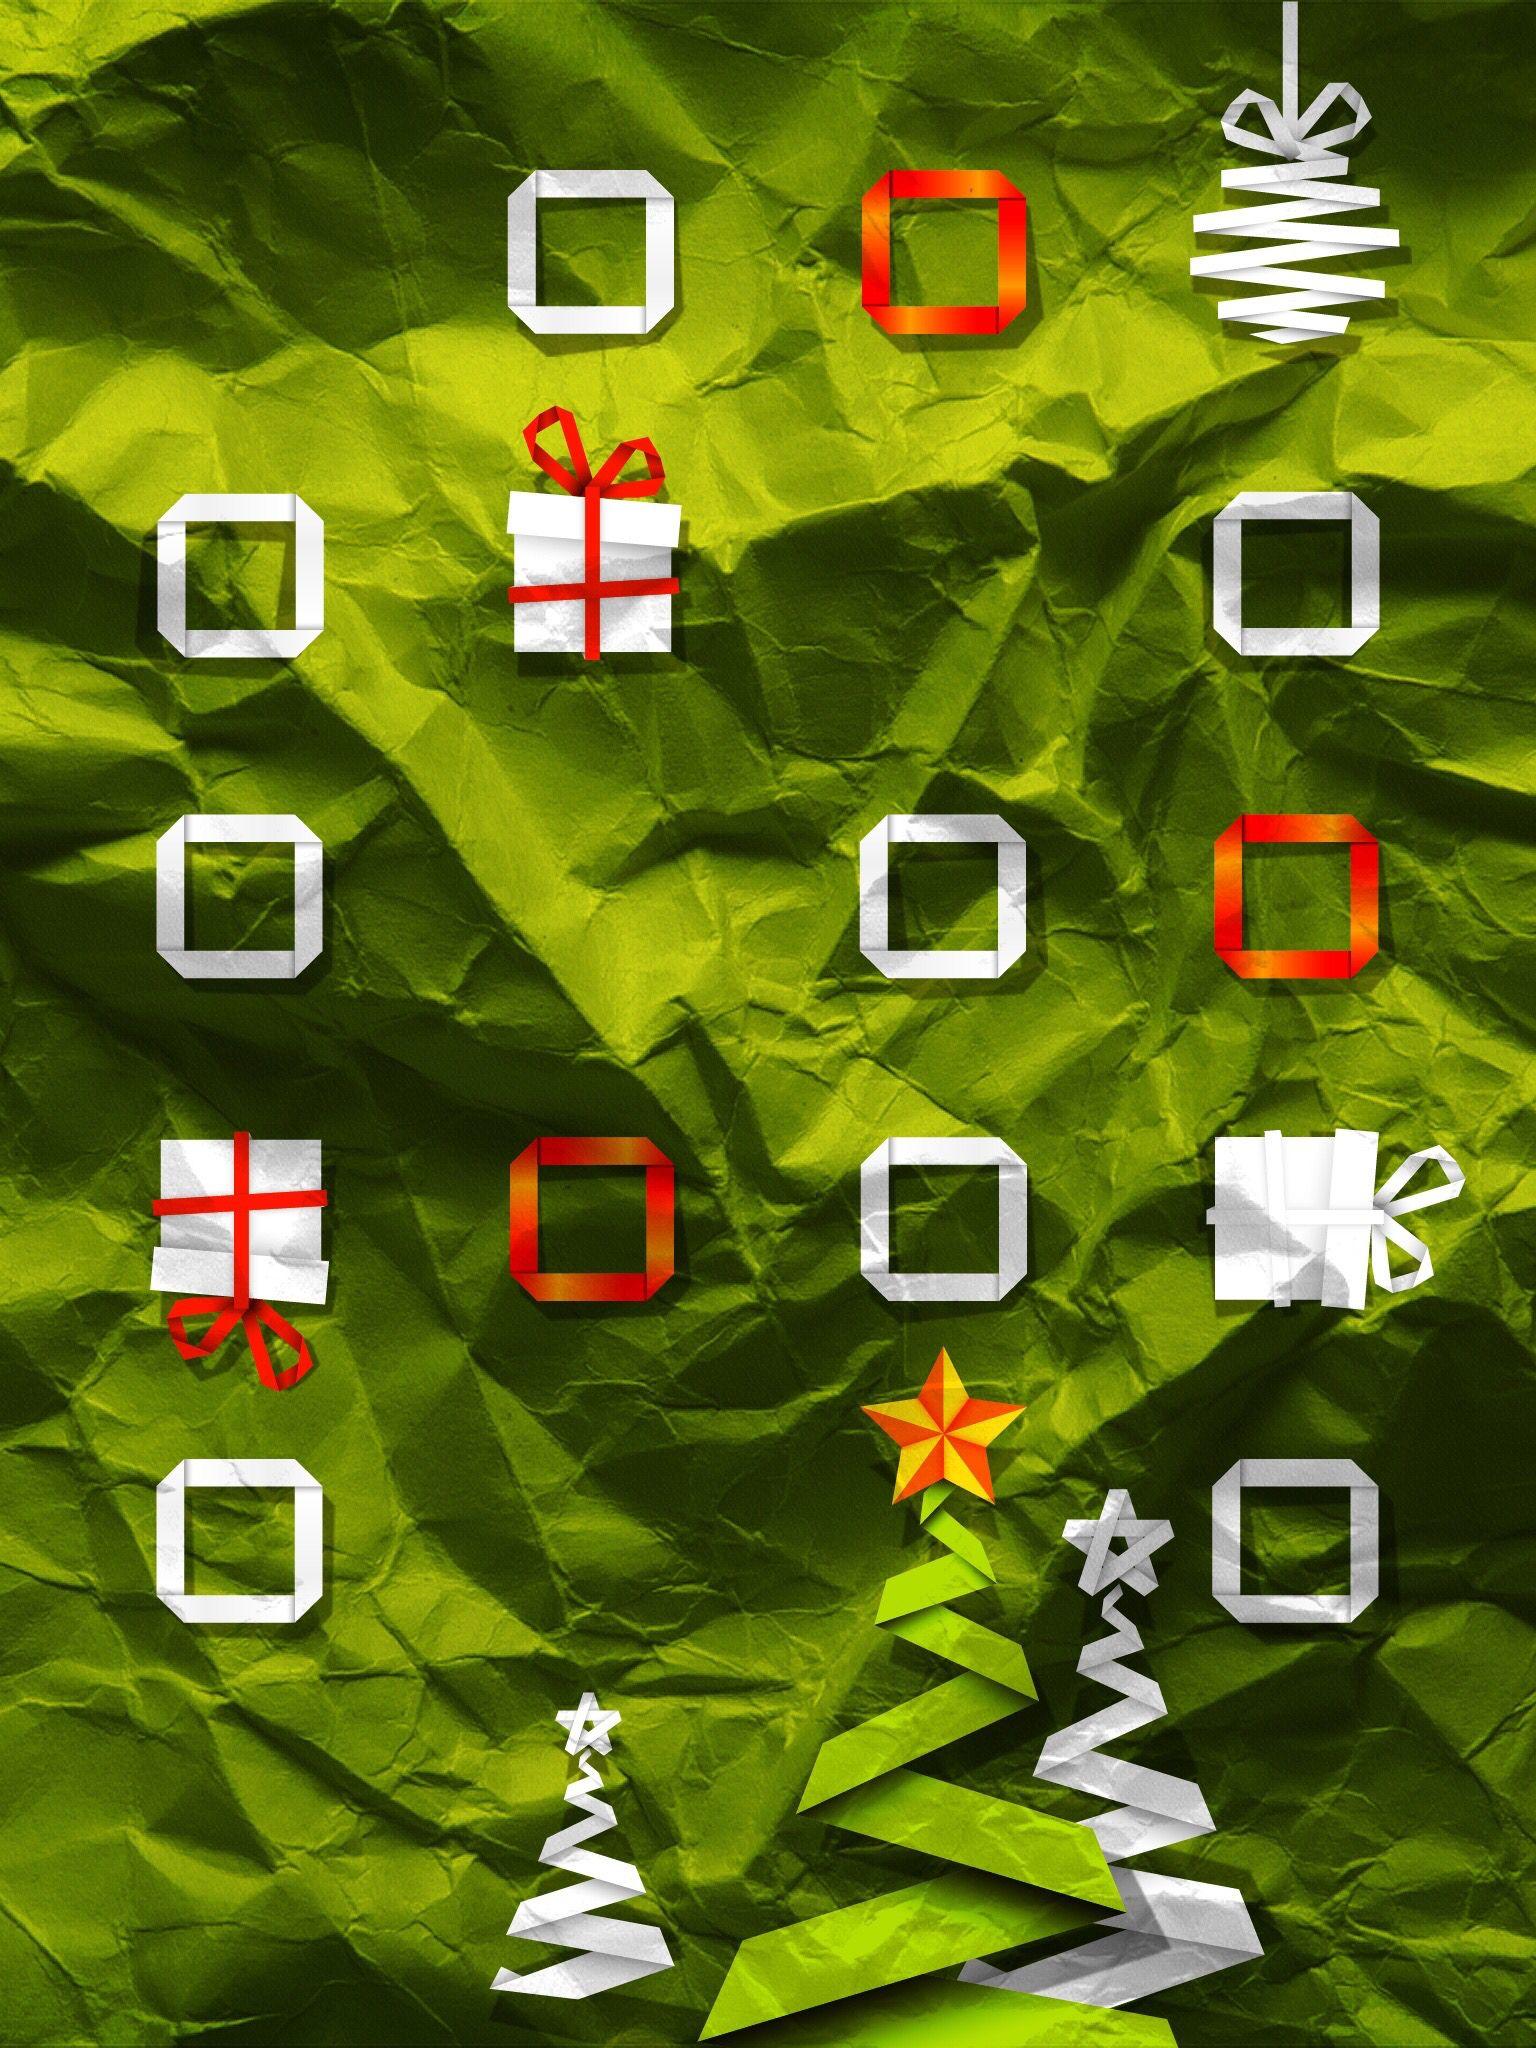 App / Icon Skin Wallpaper Ipad mini, Wallpaper, App icon